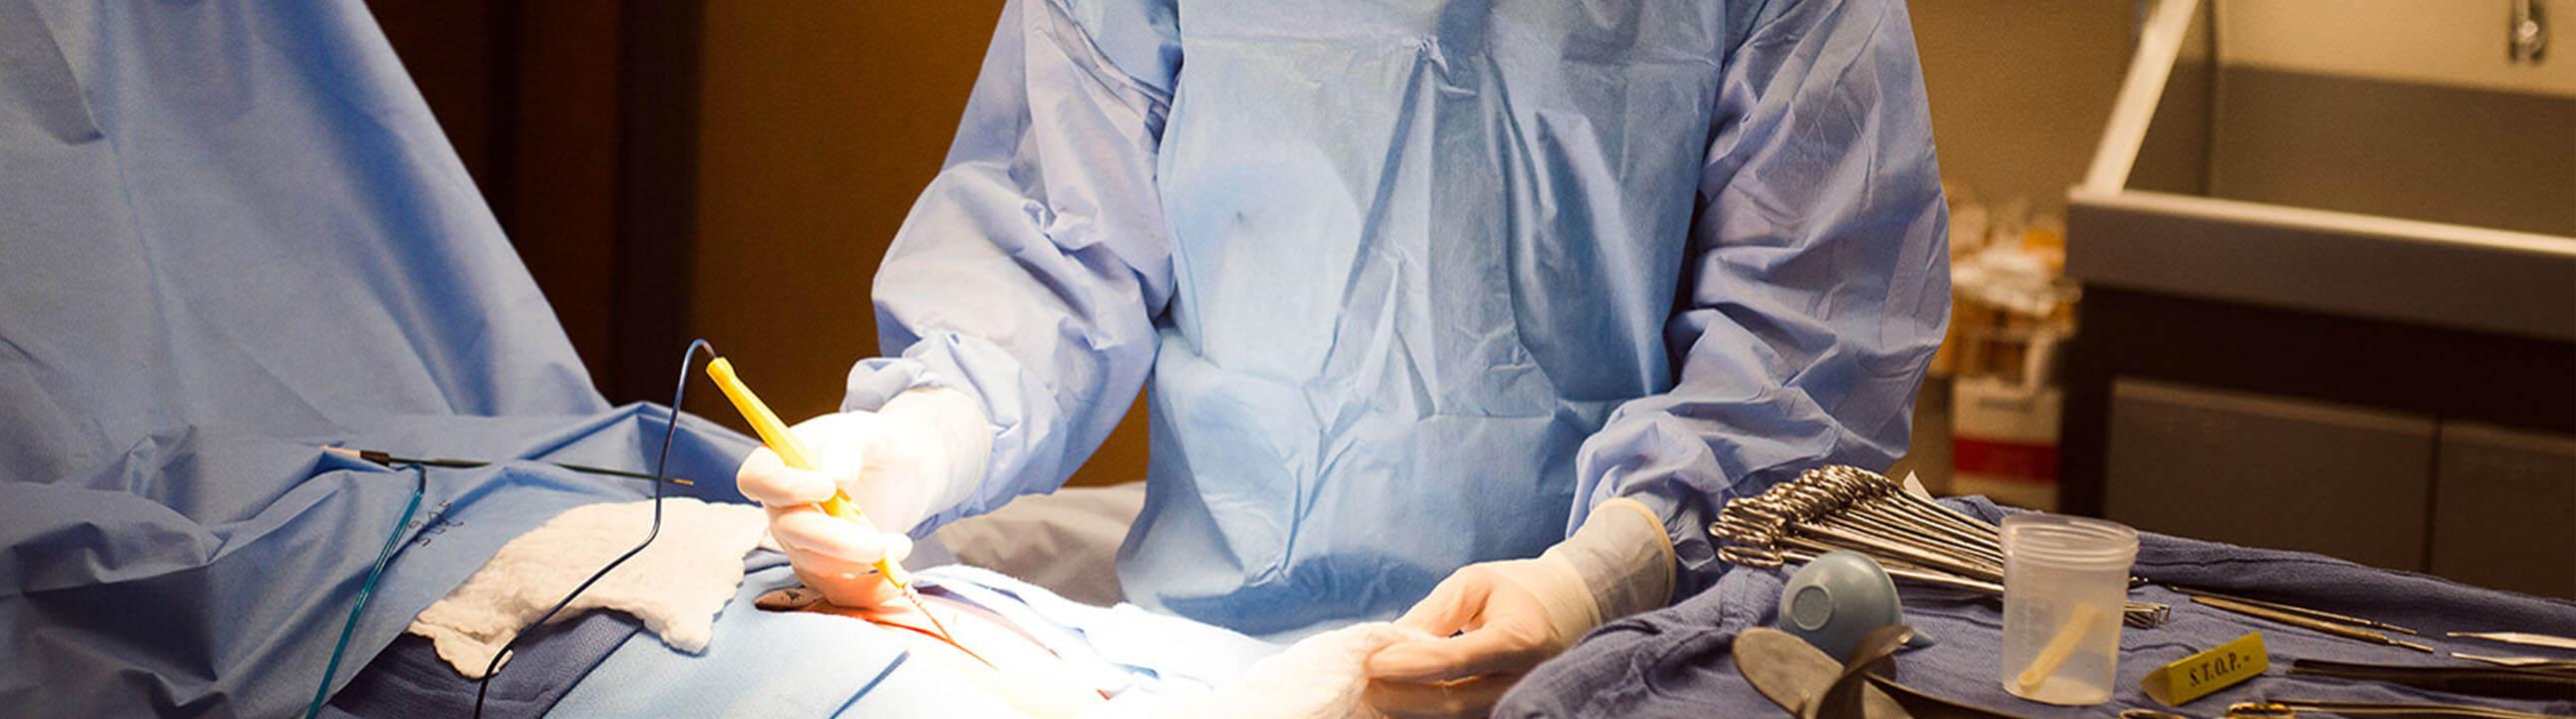 Cst Aas Surgical Technology Wvu Parkersburg